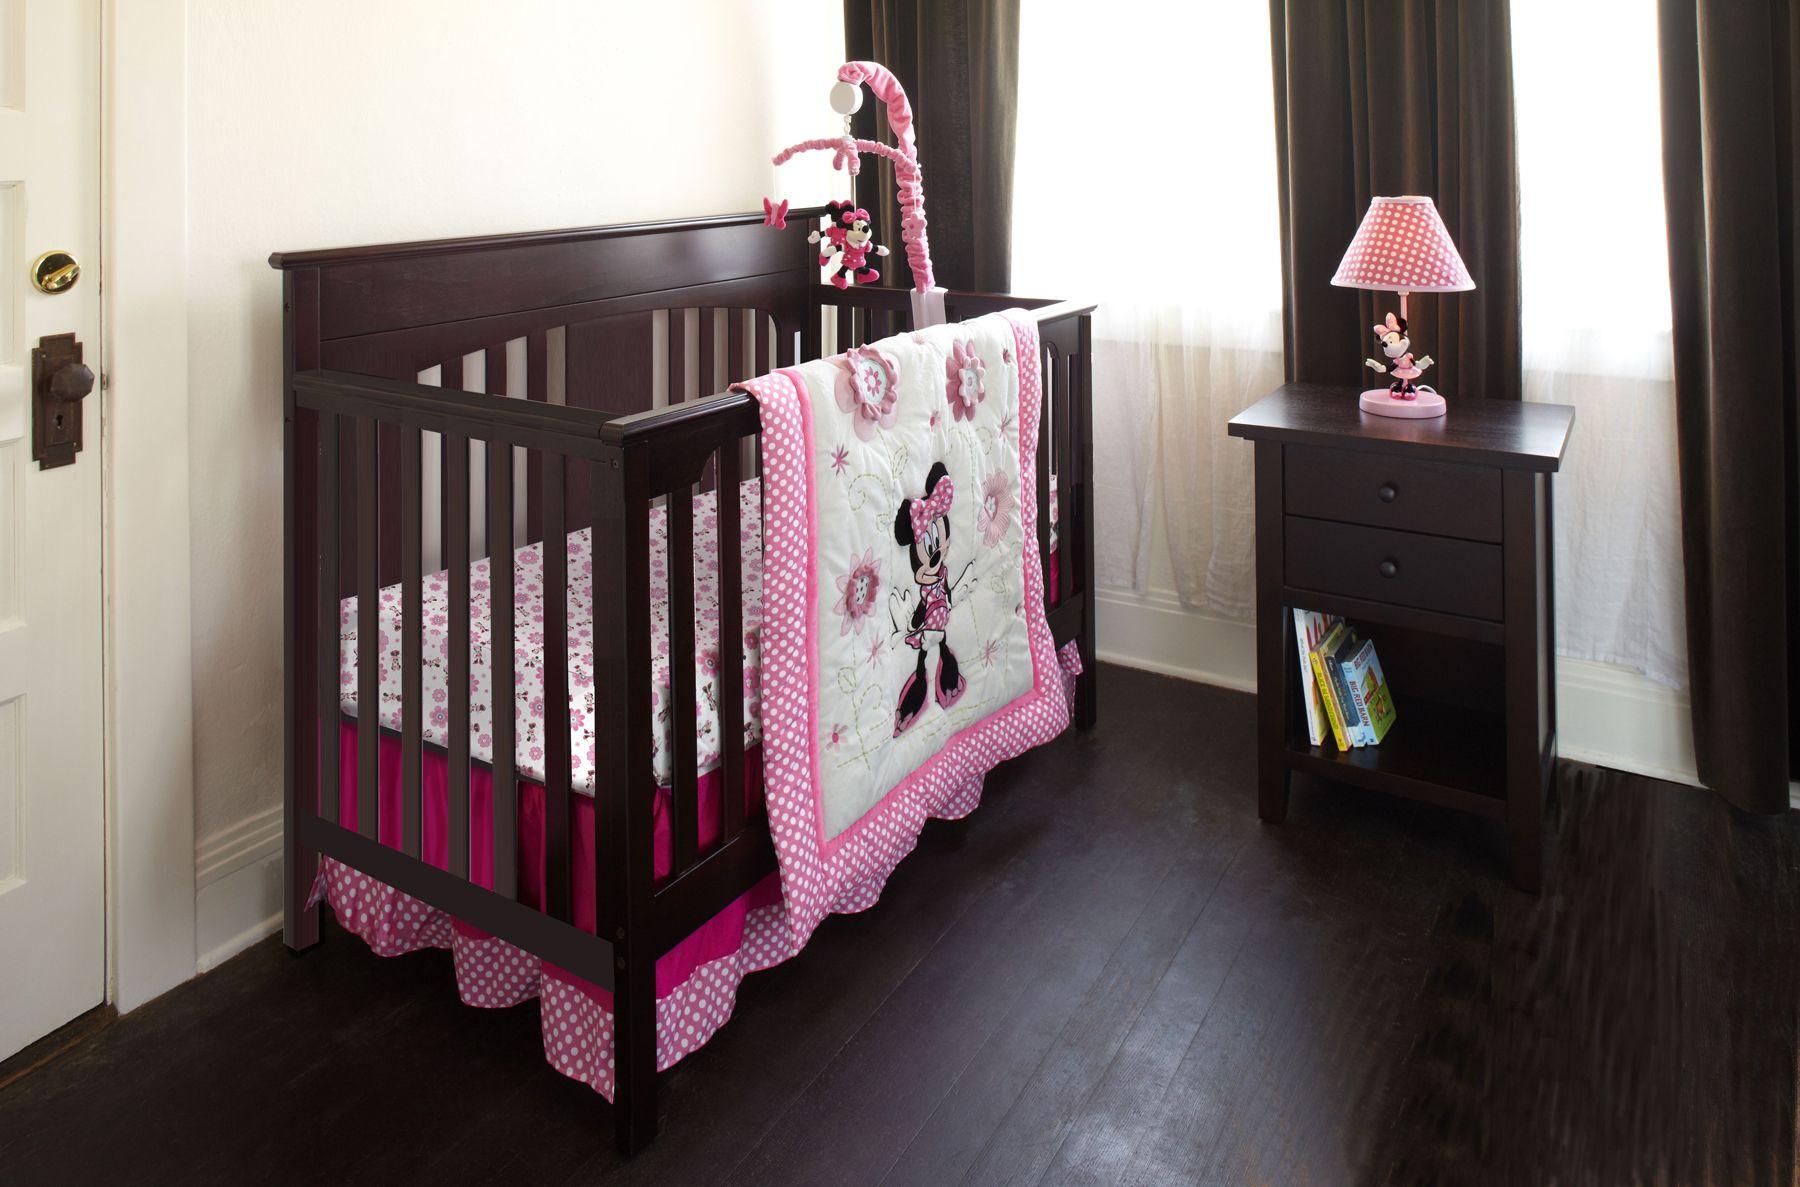 minnie mouse 6pc crib bedding set  minnie mouse bedding